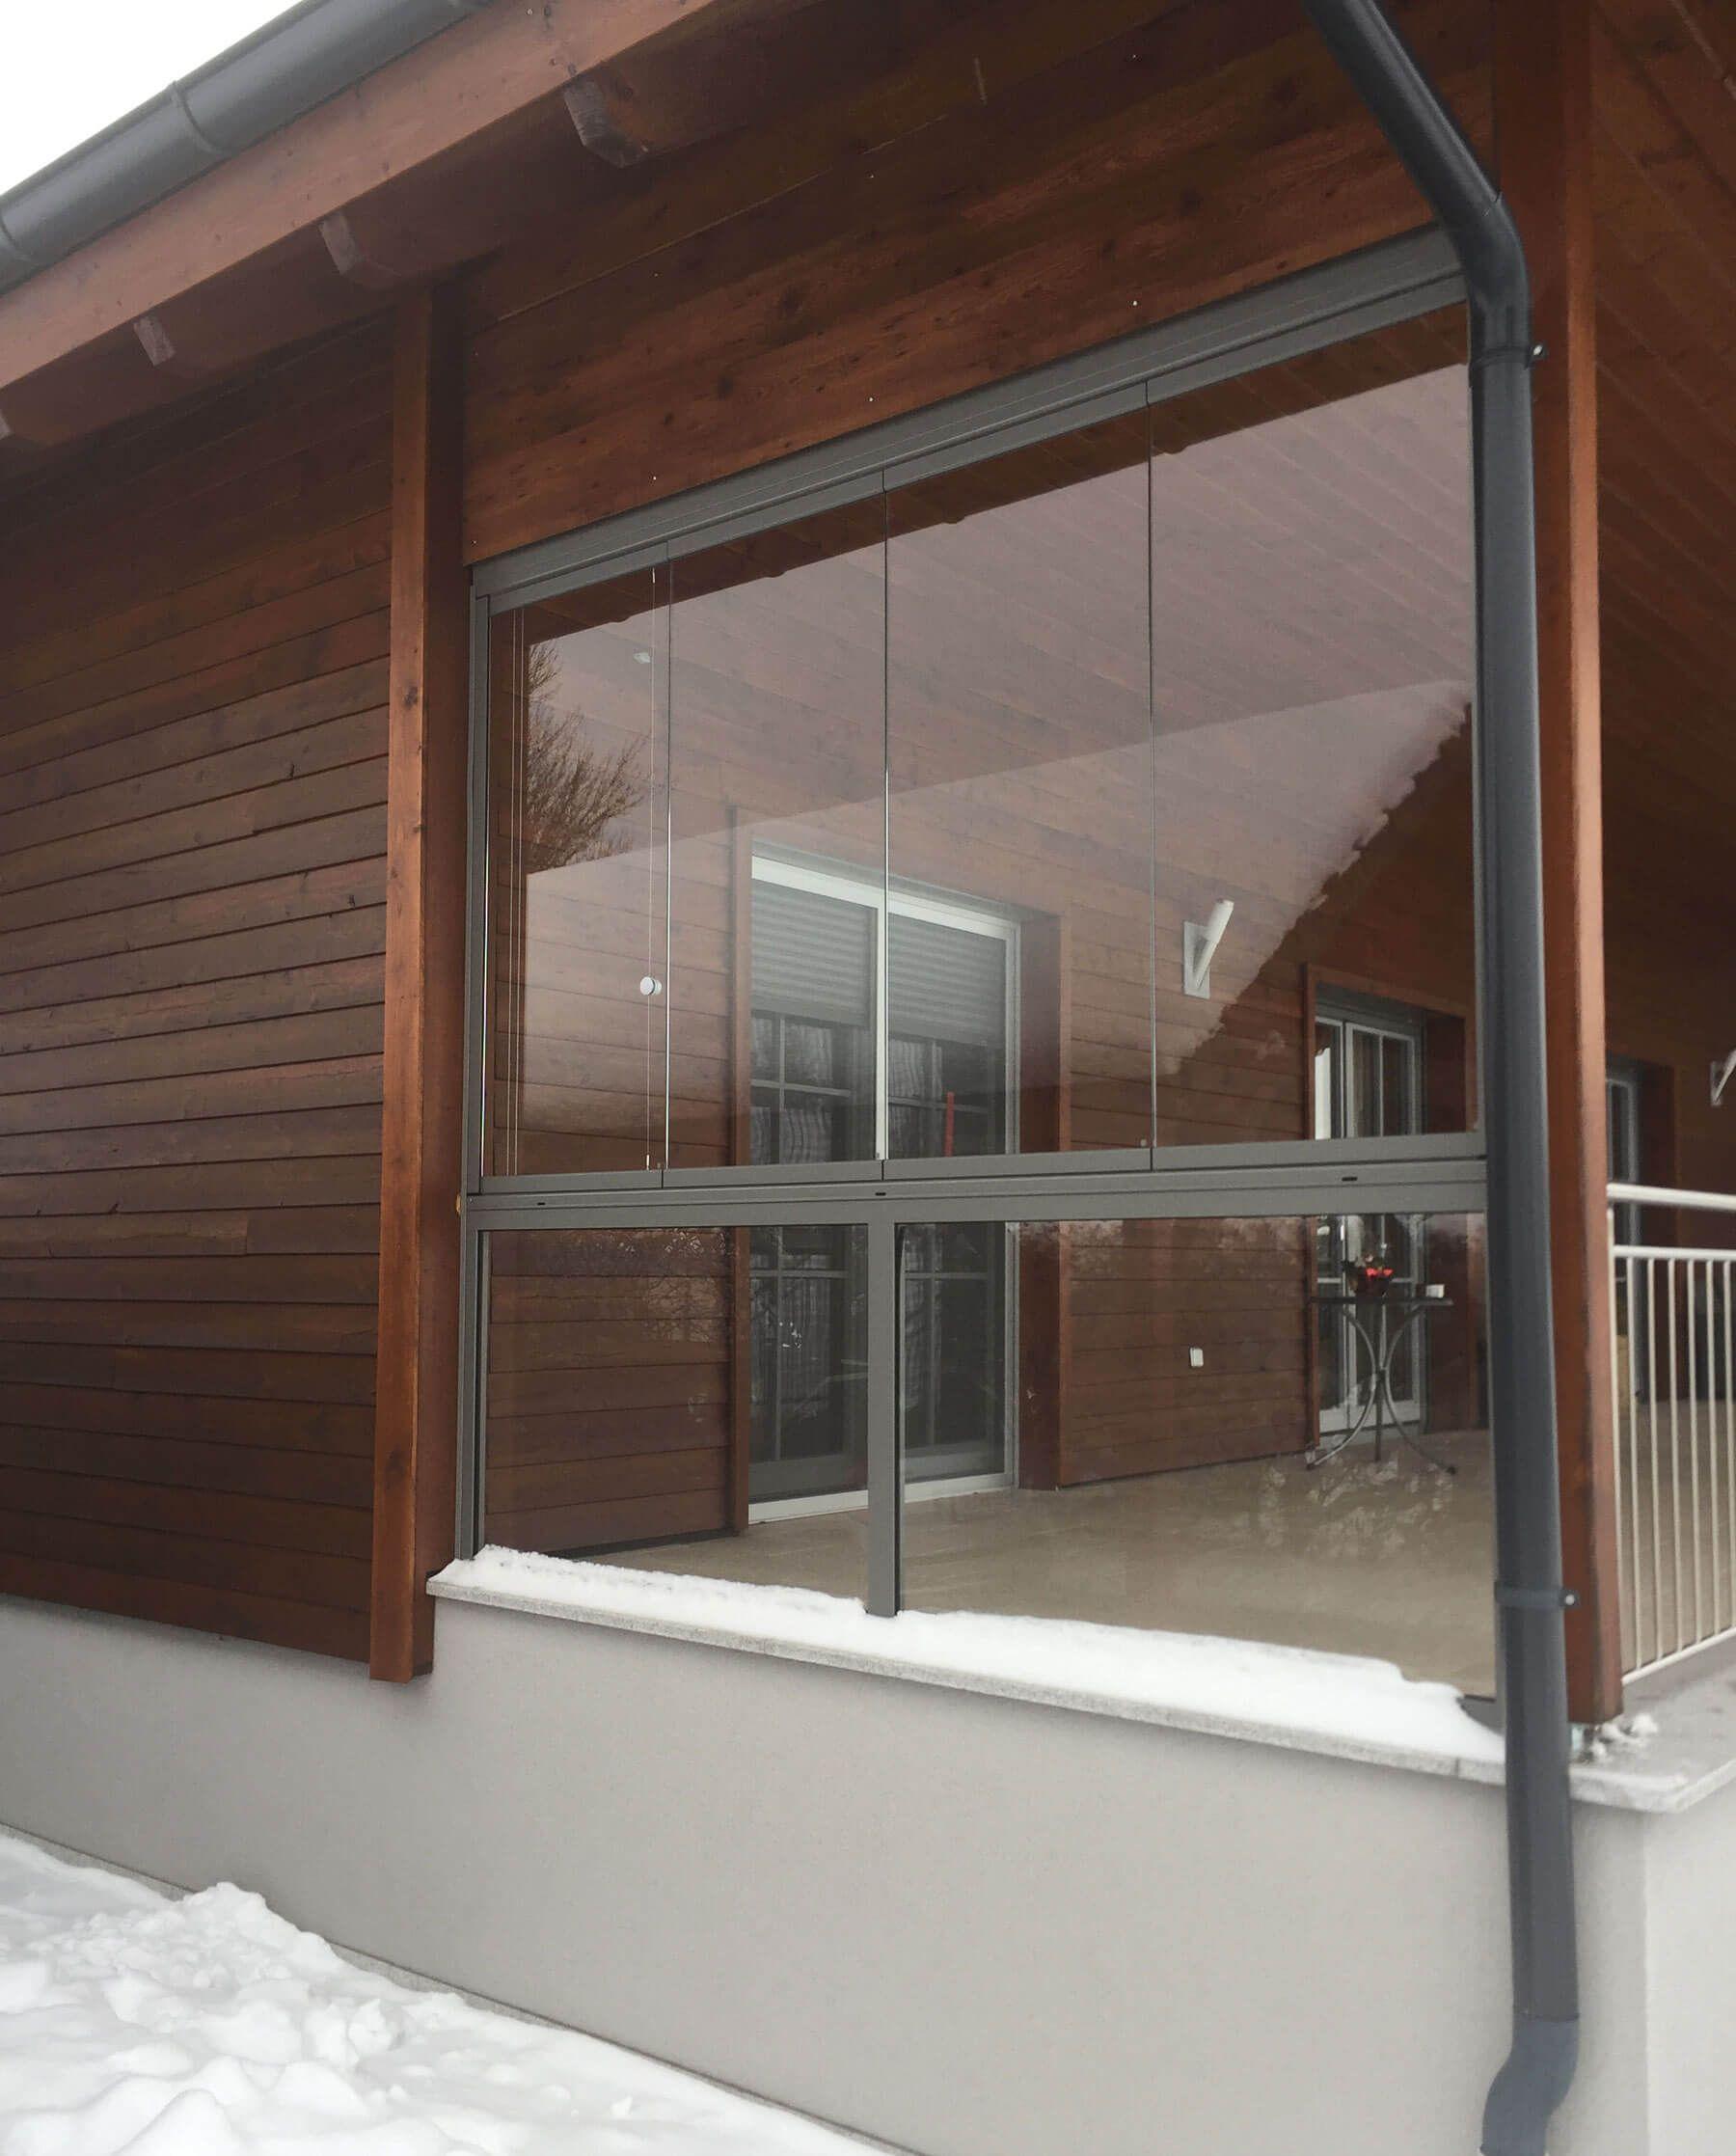 windschutz f r terrasse aus glas veranda pinterest sliding door verandas and doors. Black Bedroom Furniture Sets. Home Design Ideas